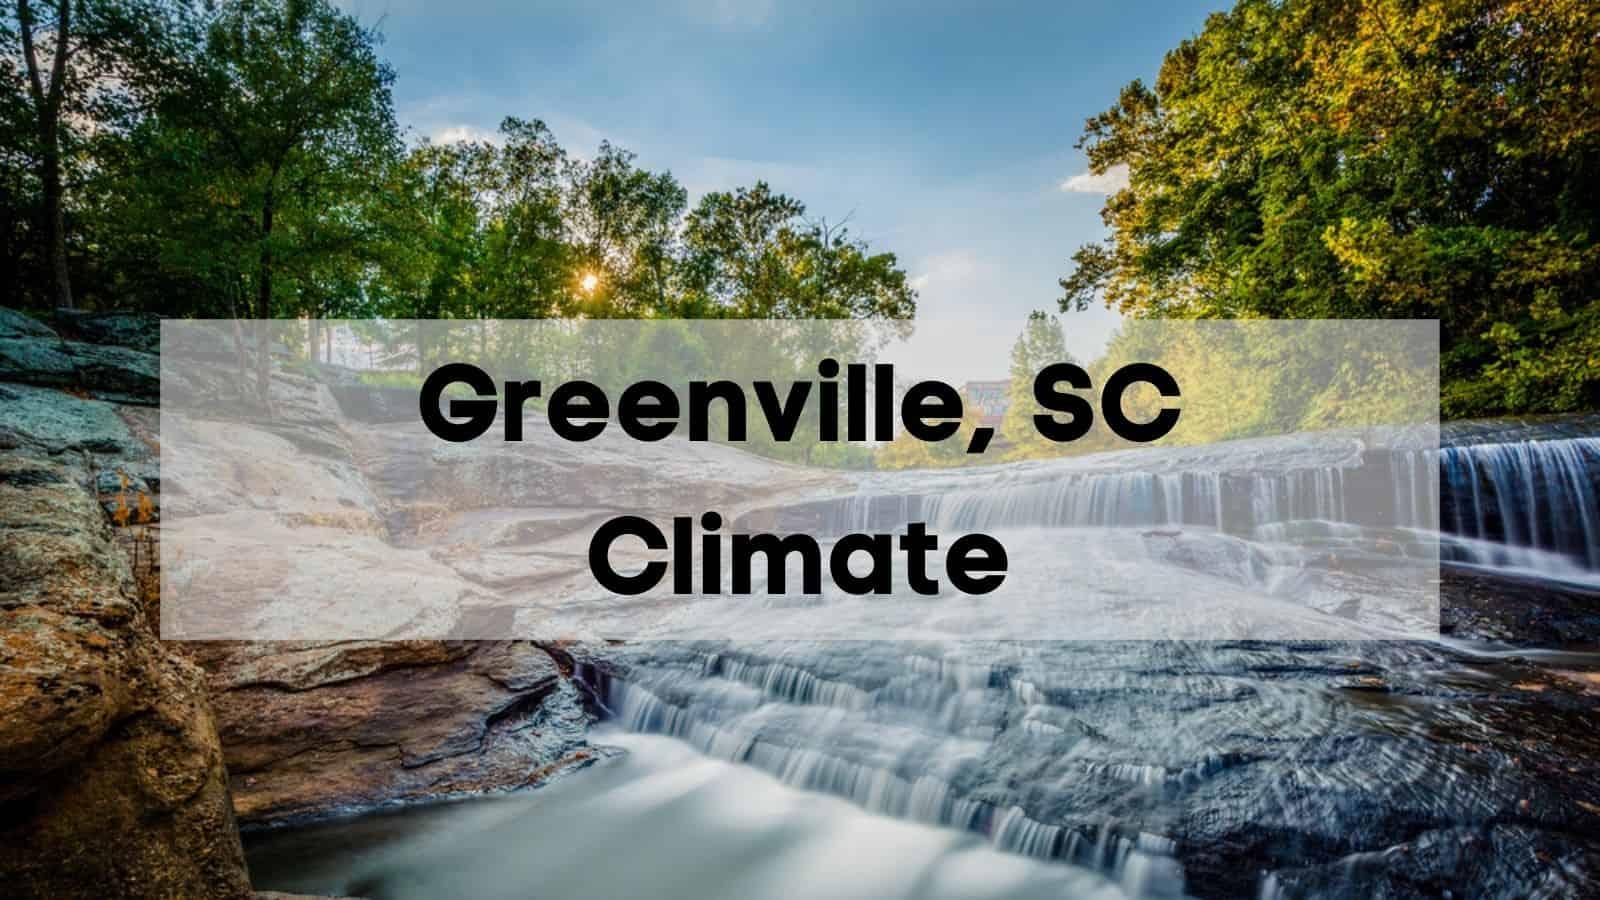 greenville, sc climate